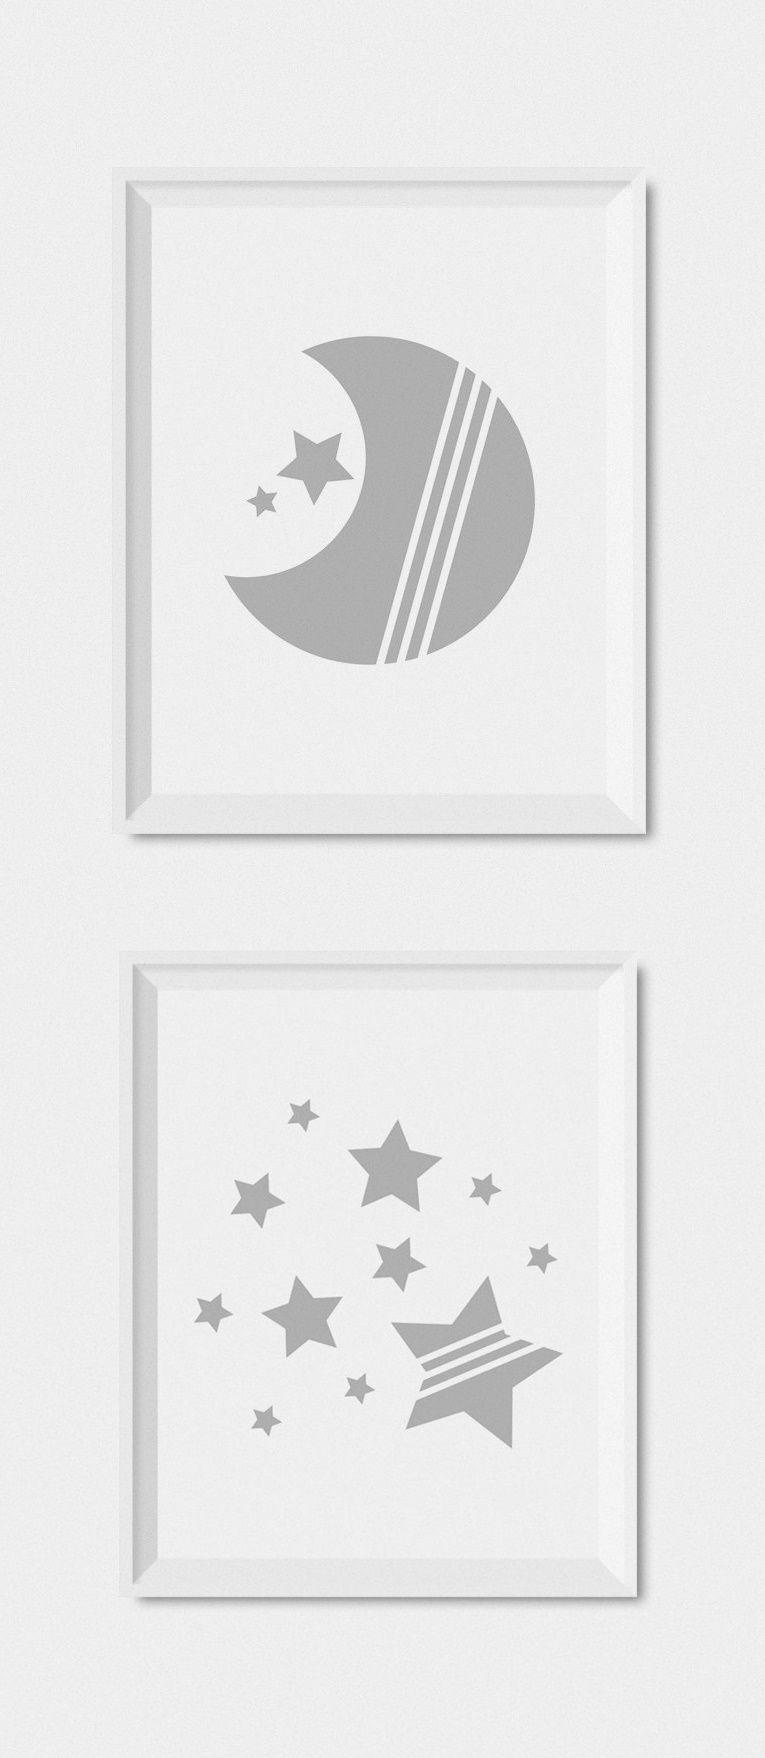 Modern Gender Neutral Gray Nursery Decor DIY Nursery Printables Moon And Stars Nursery Wall  sc 1 st  Pinterest & Moon And Stars Nursery Prints Set Of Prints For Nursery Baby Wall ...